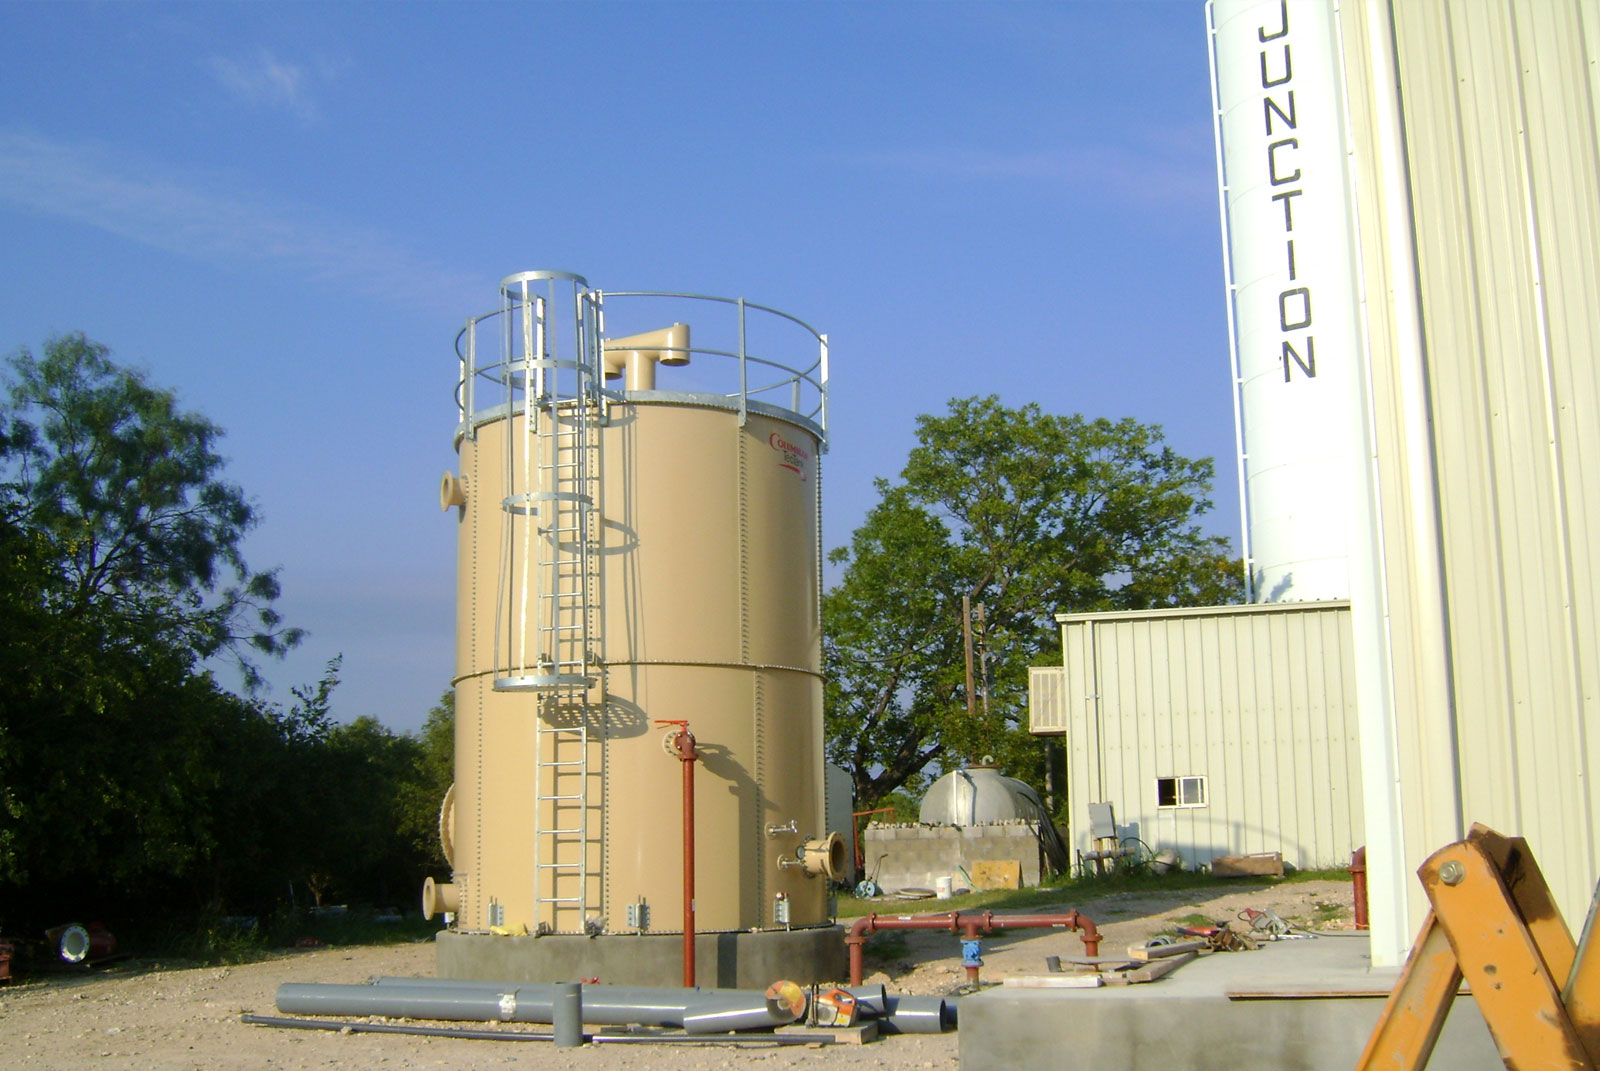 City of Junction Water Treatment Plant Expansion - LEM